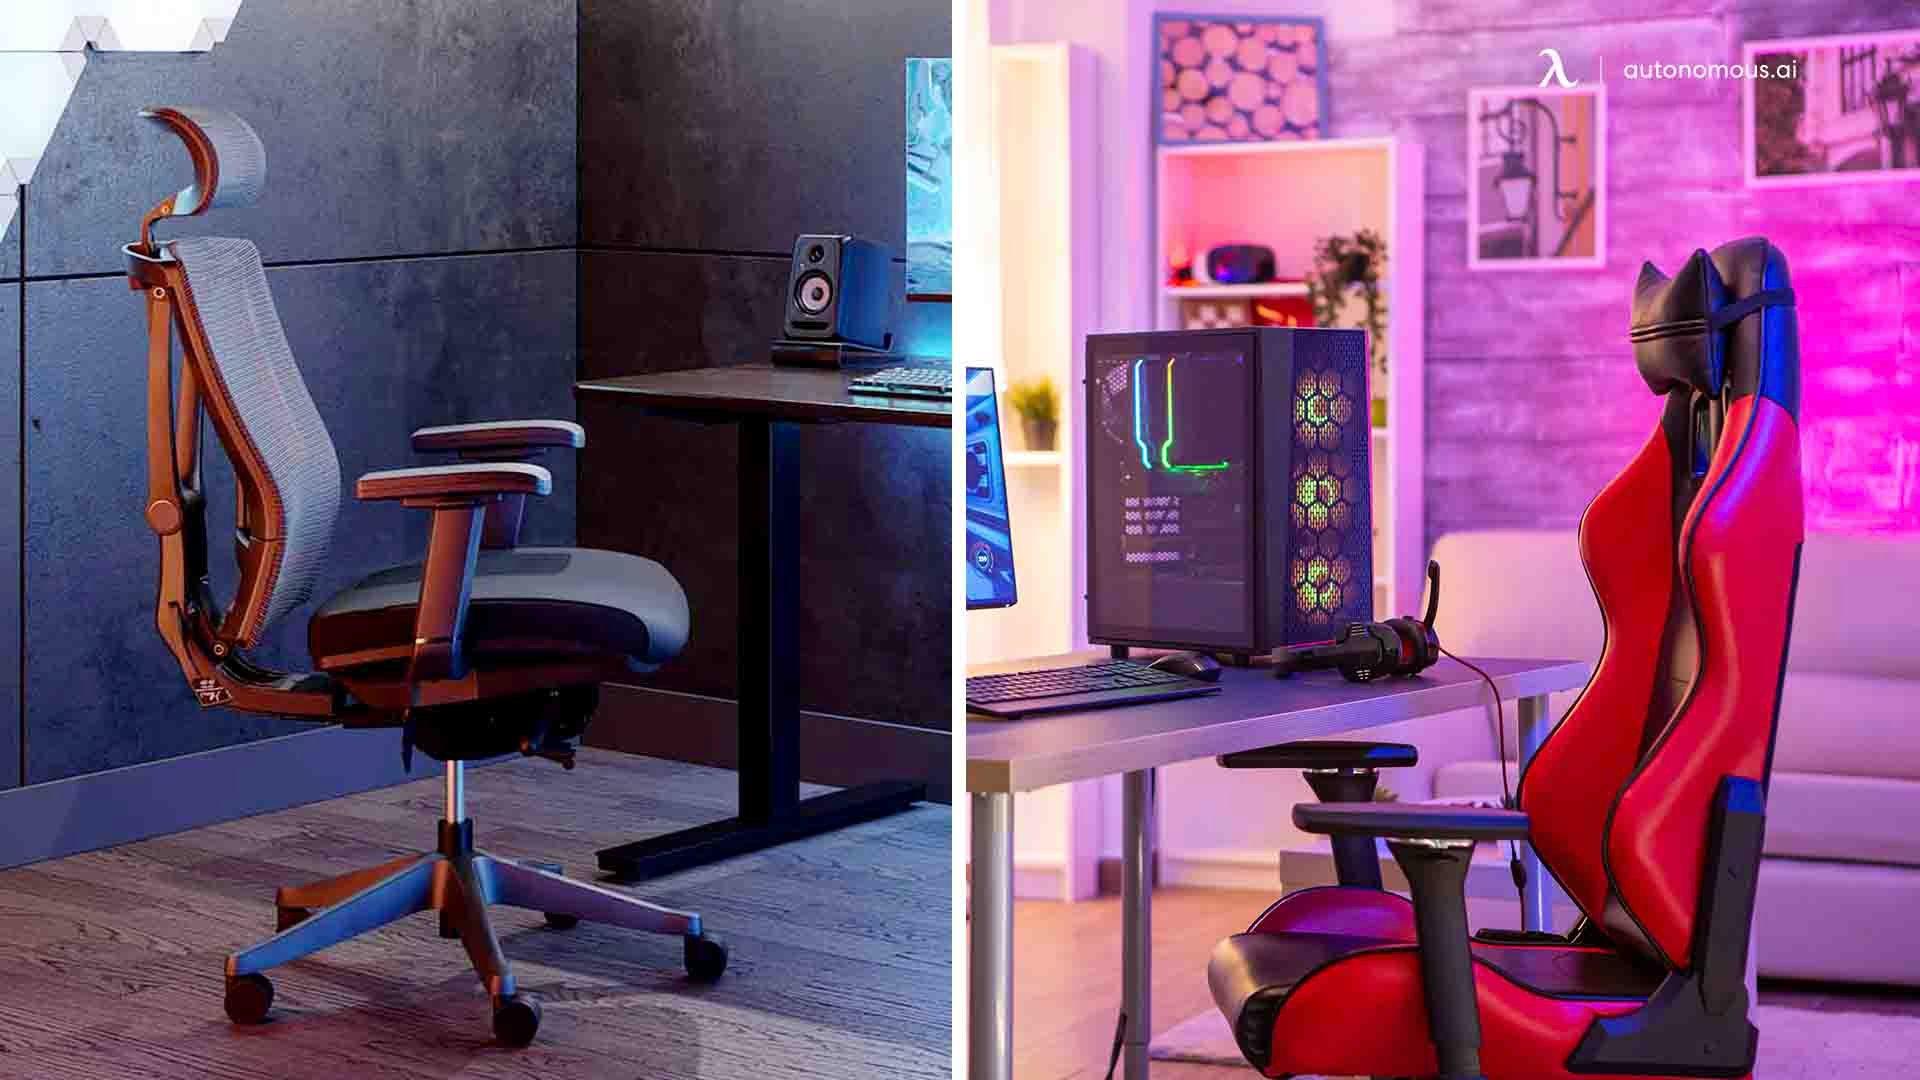 Ergonomic Chair Vs. Normal Gaming Chair